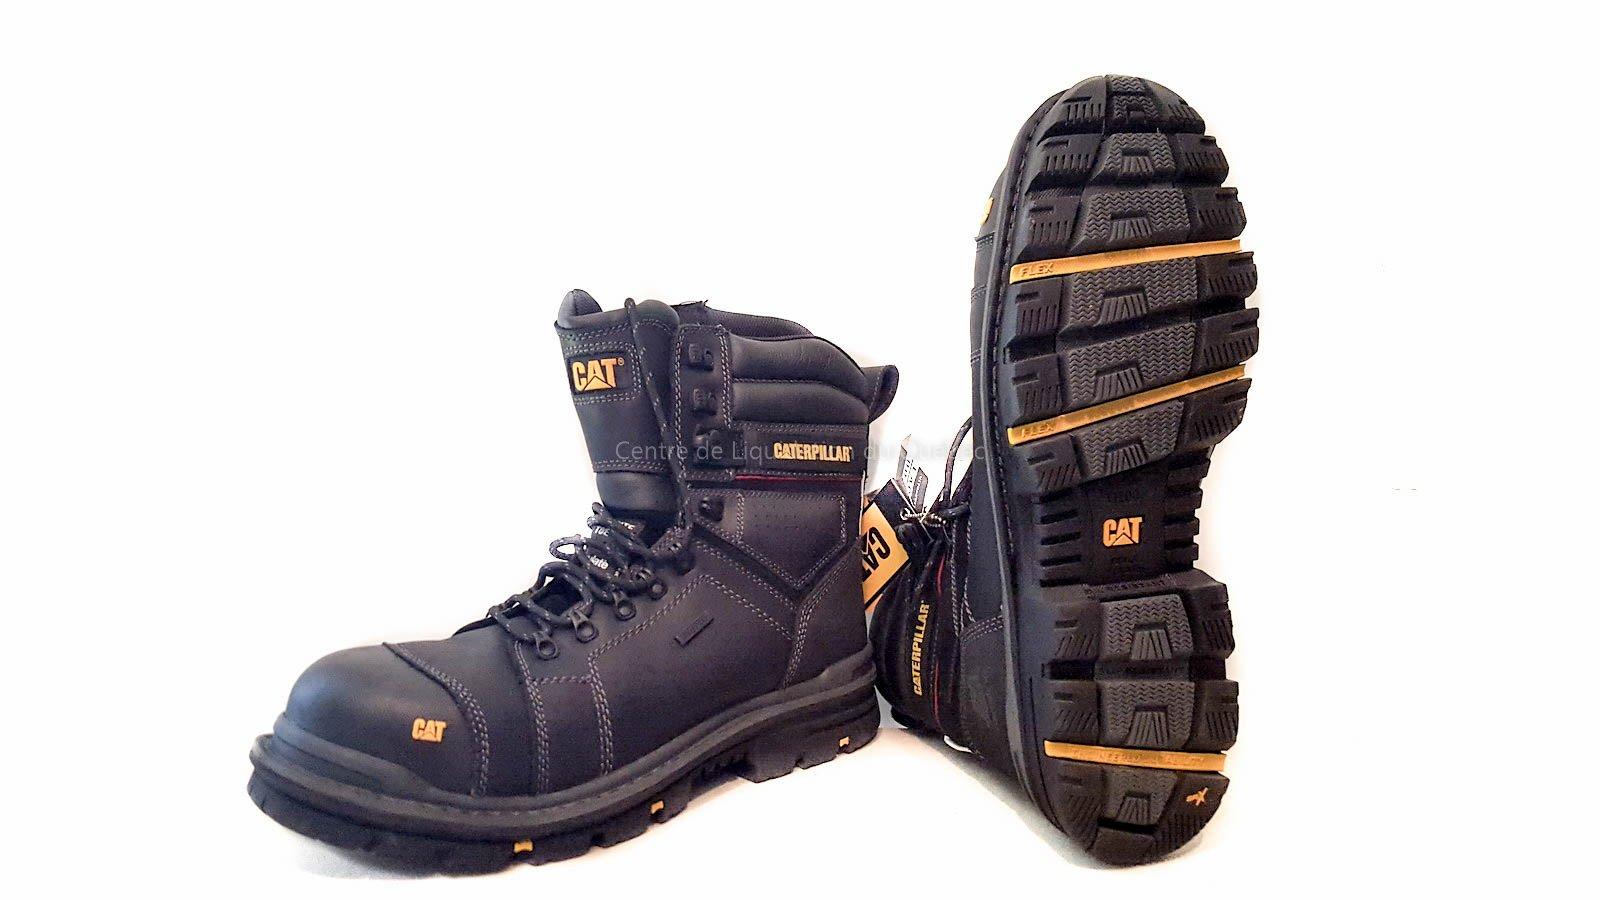 Chaussure de sécurité CATerpillar T-1200 (Noir)